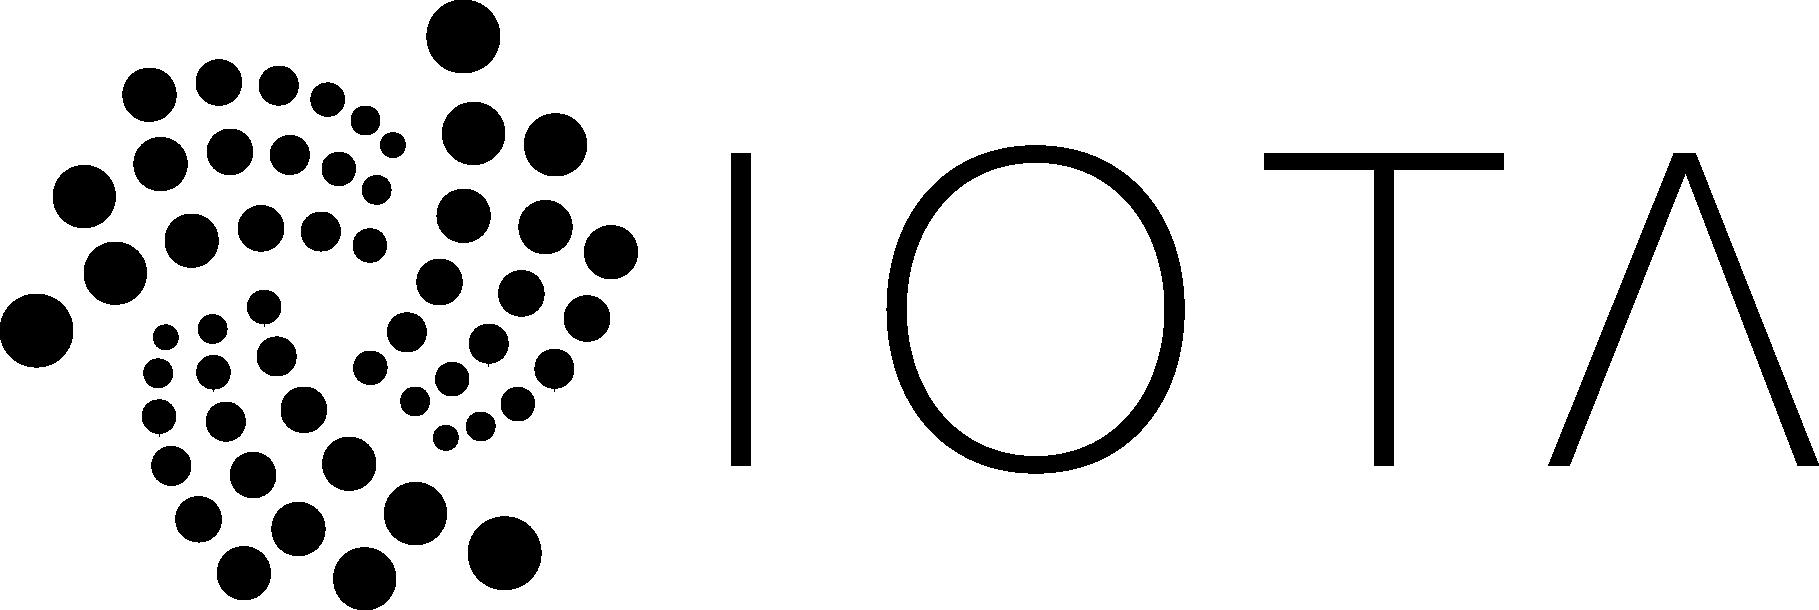 Iotaロゴ